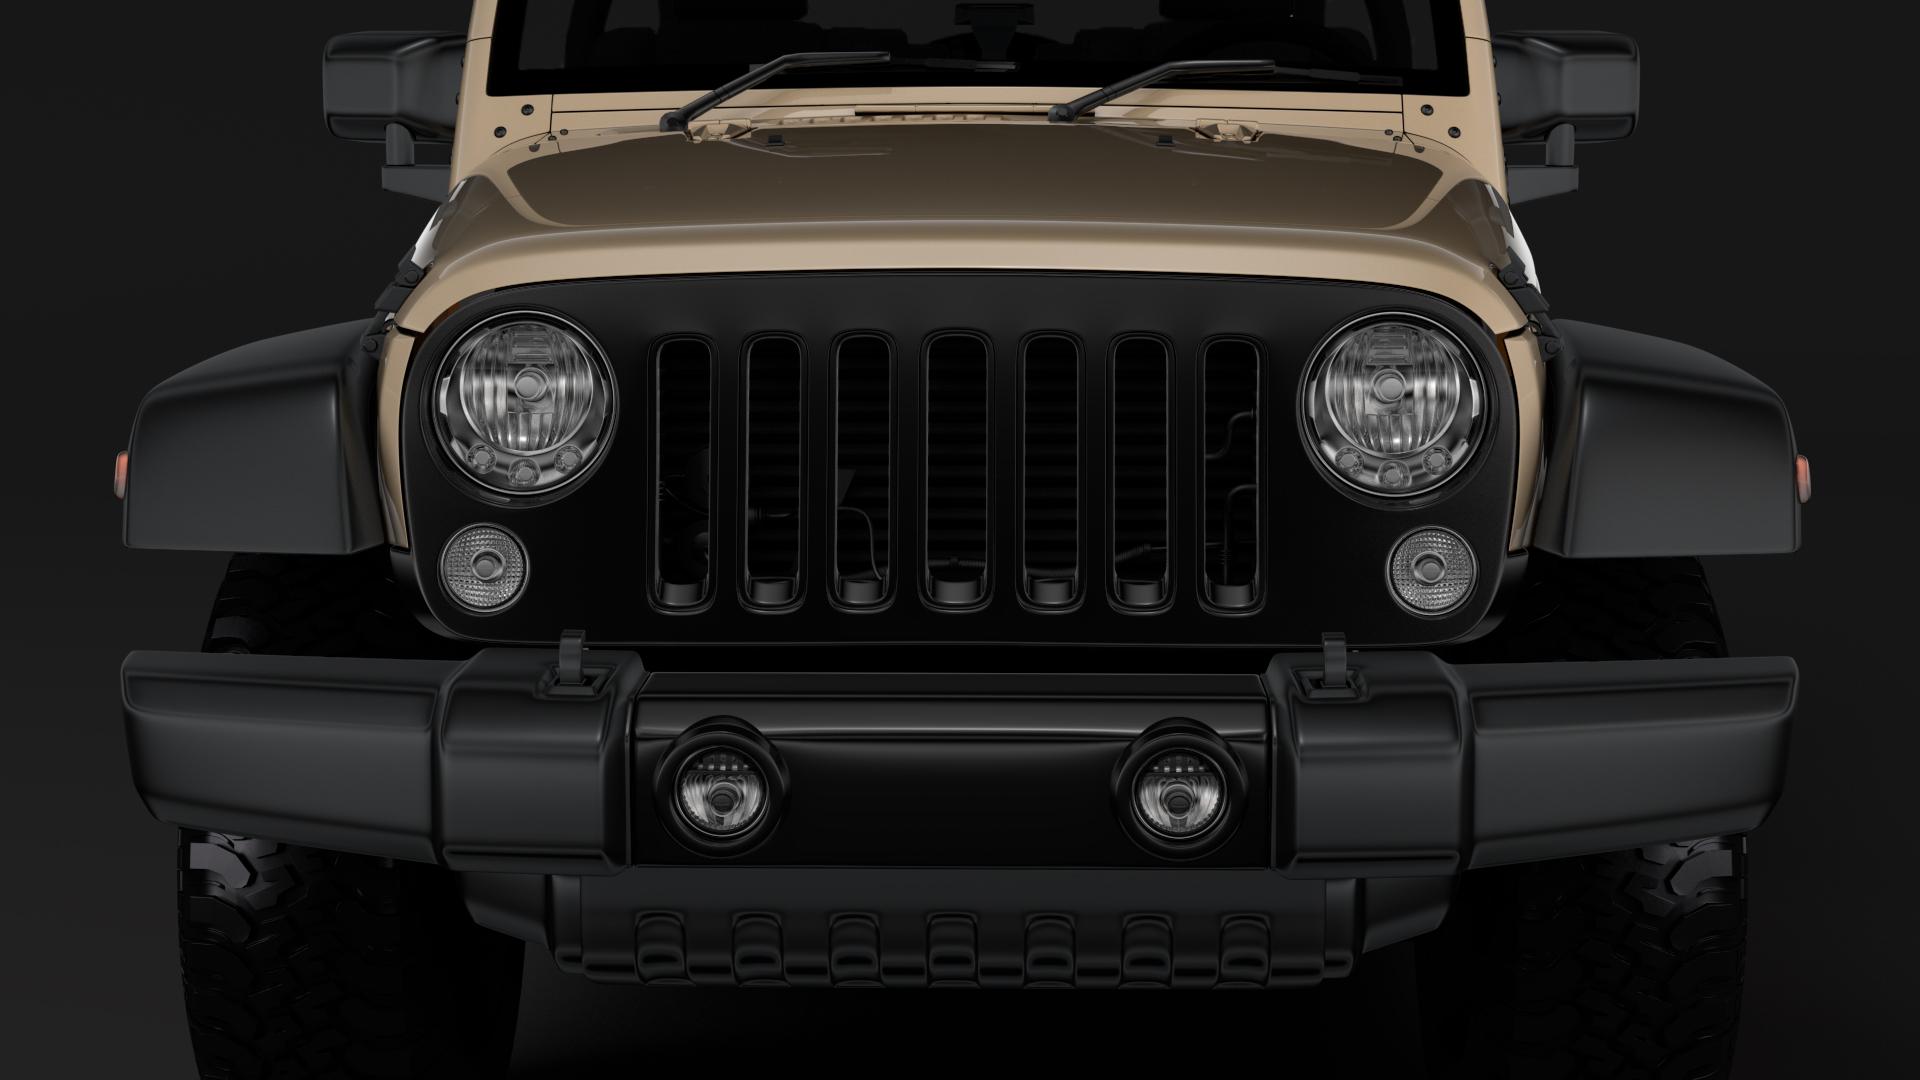 jeep wrangler willys wheeler jk 2017 3d model max fbx c4d lwo ma mb hrc xsi obj 276796